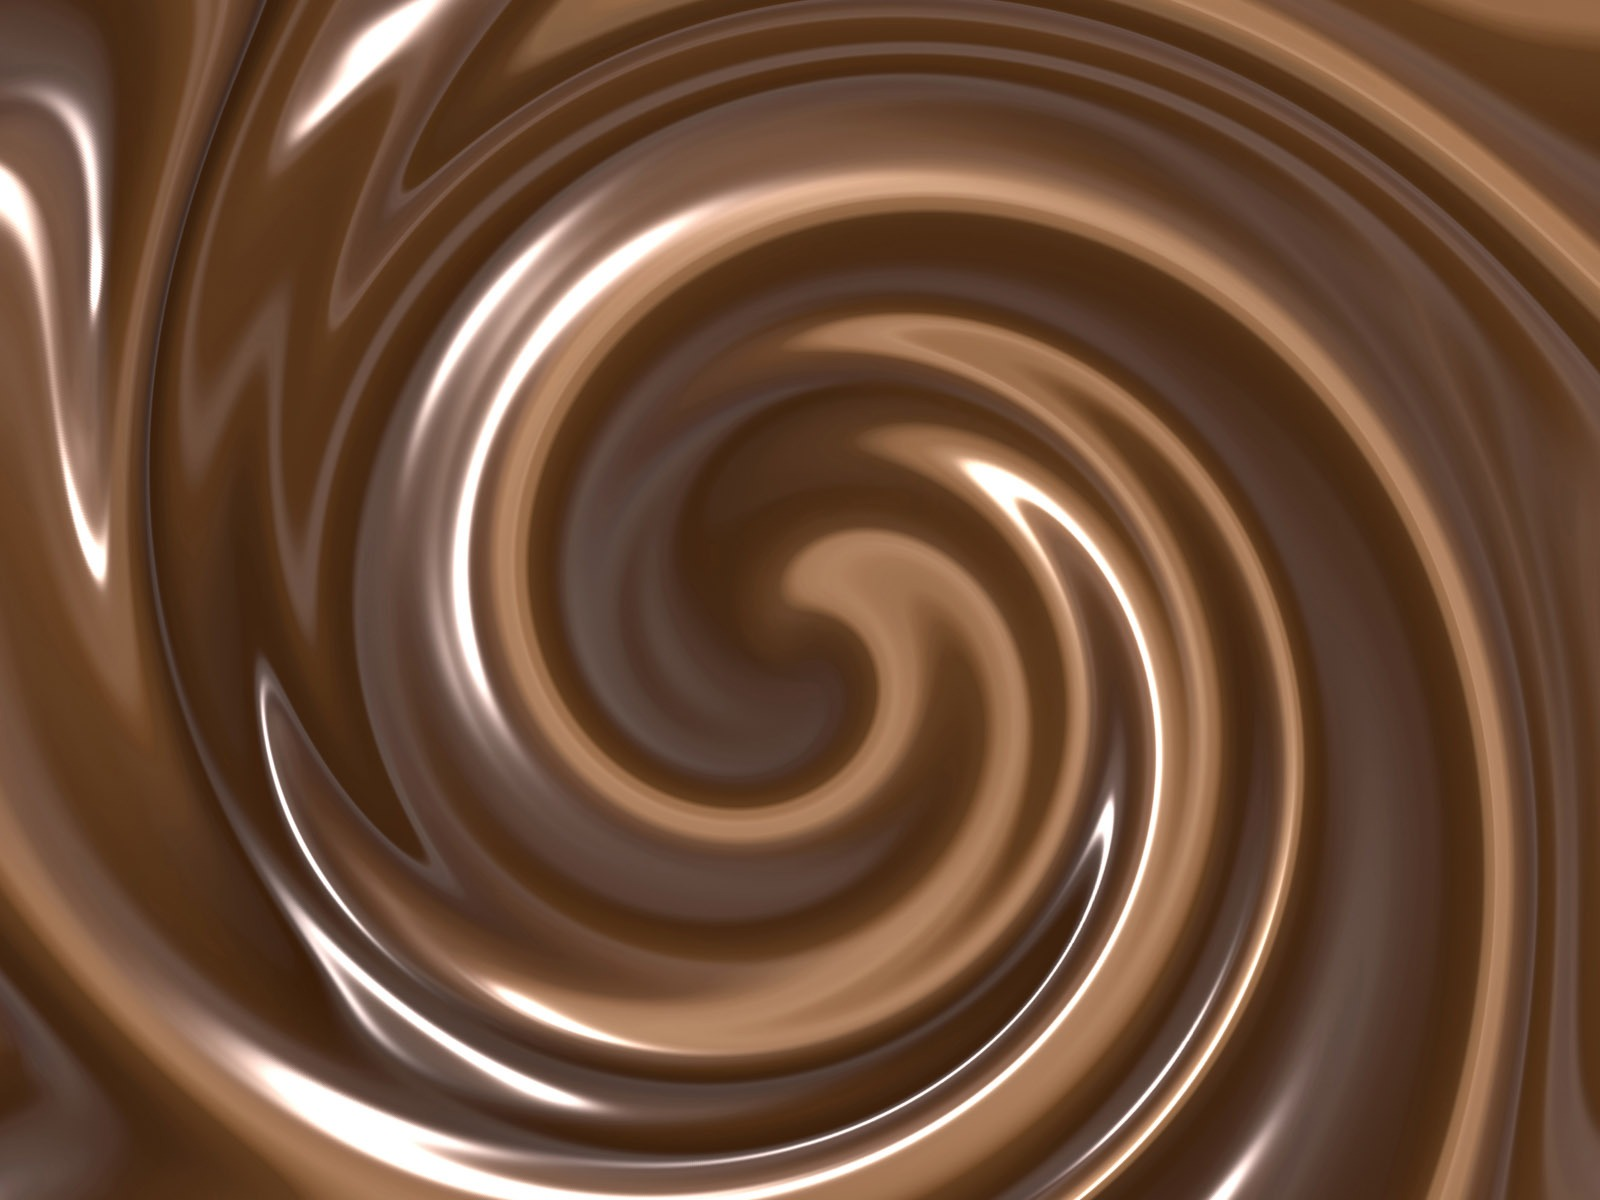 Fondos De Pantalla De Chocolates: Chocolate Plano De Fondo (2) #5